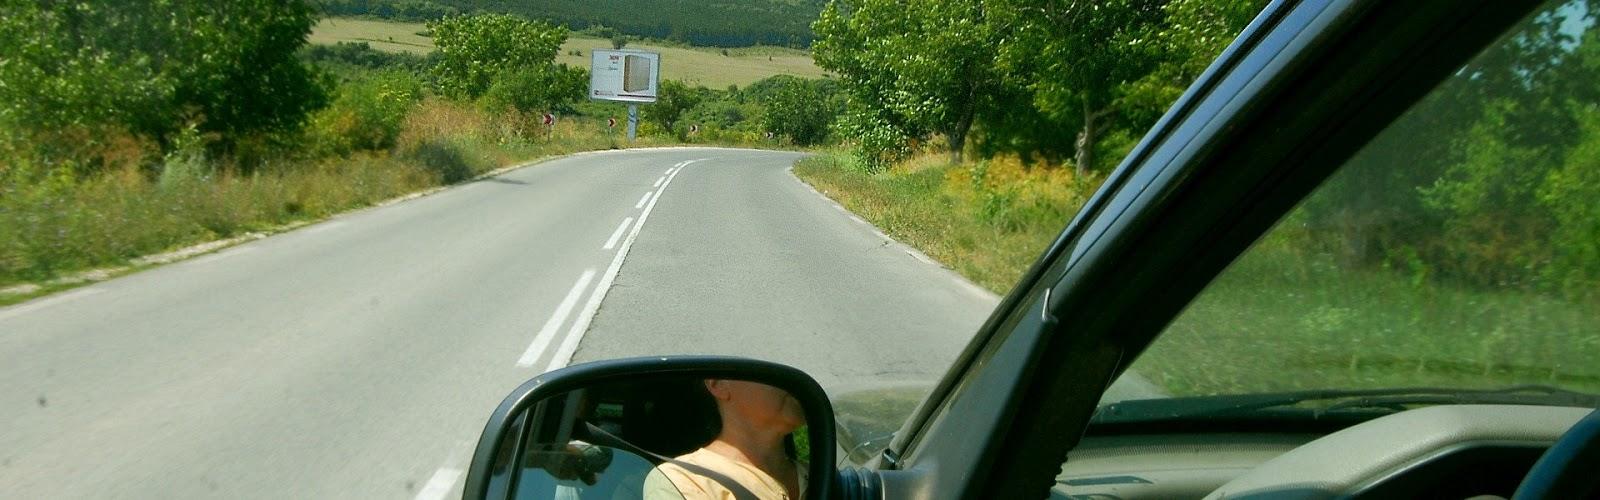 Турист без автомобиля в Болгарии - это ¼ туриста.